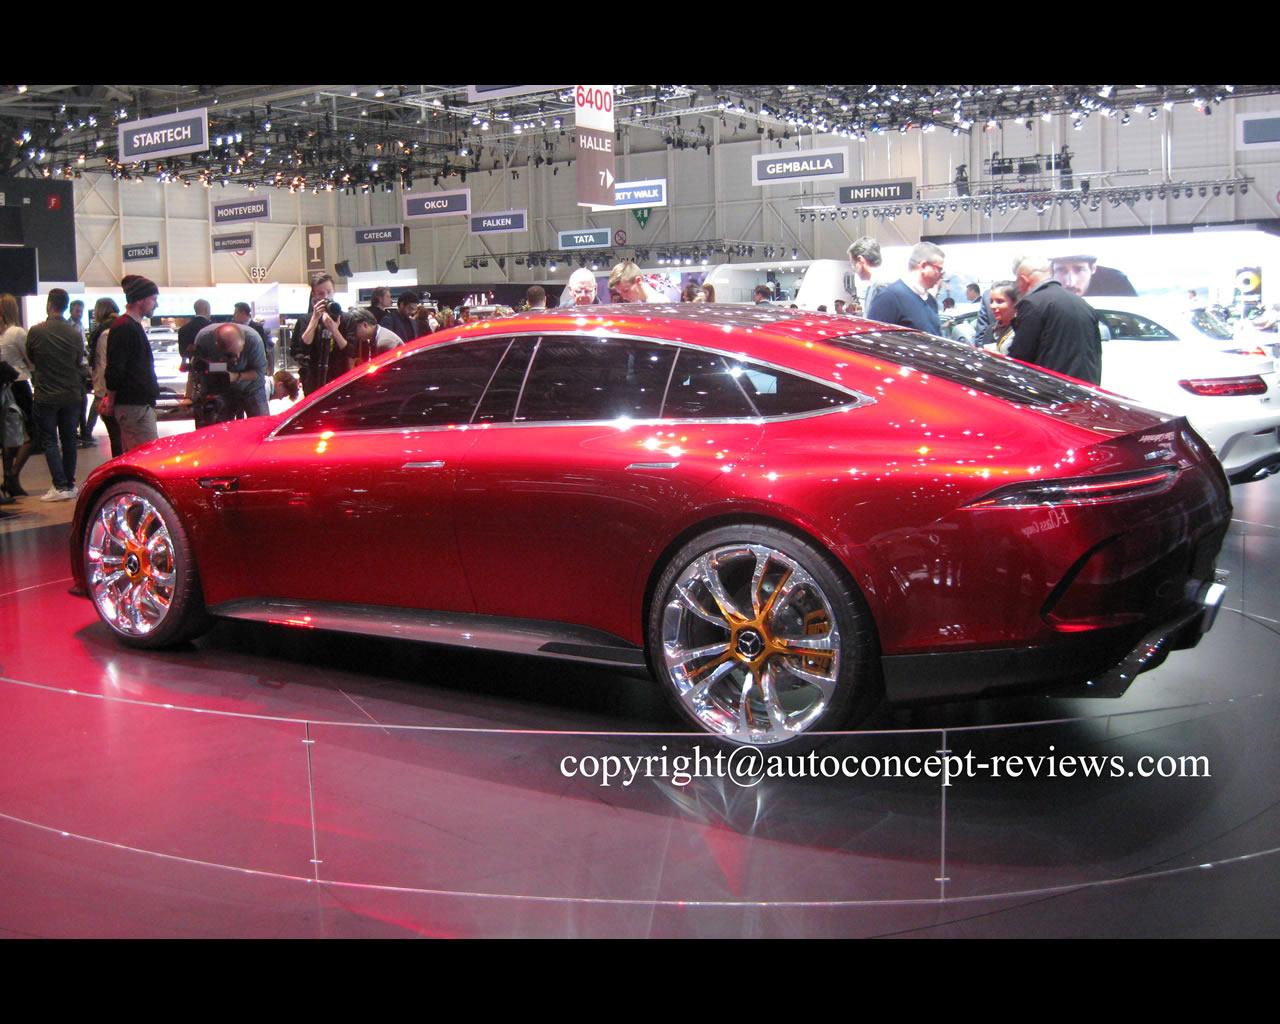 http://www.autoconcept-reviews.com/cars_reviews/mercedes/mercedes-benz-amg-gt-hybrid-concept-2017/wallpapers/5-Mercedes%20Benz%20AMG%20GT%20Concept%20%20-%20Geneve%202017%20-IMG_1958.jpg